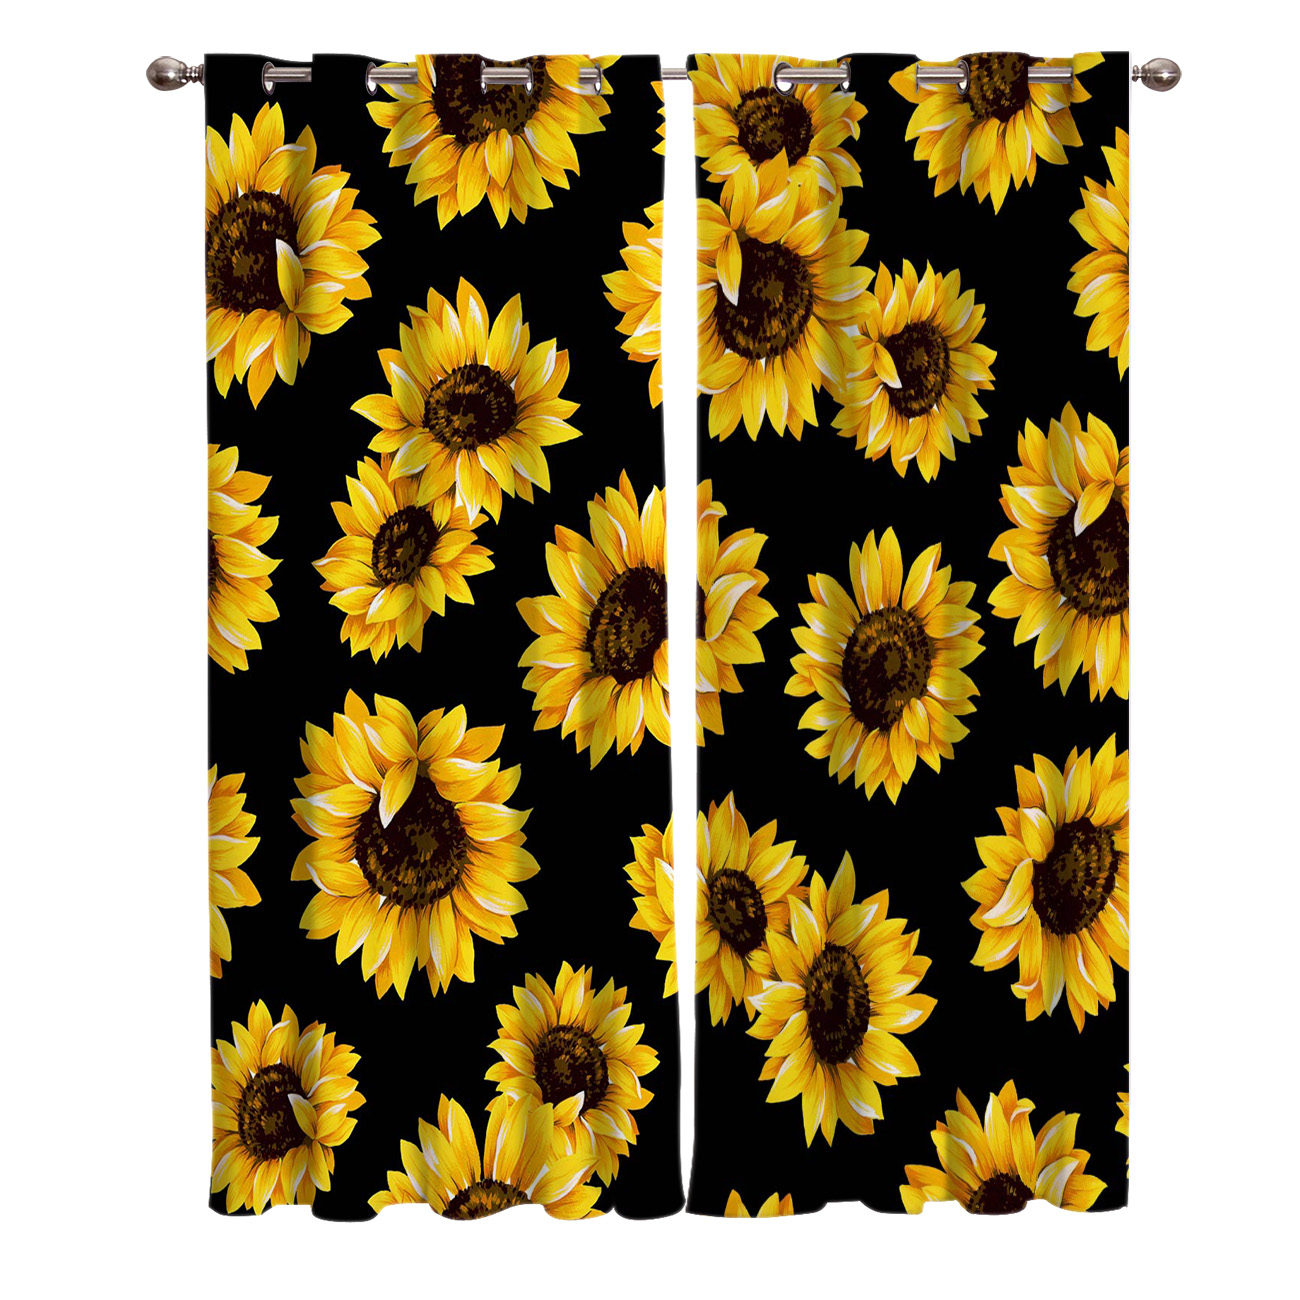 Retro Sunflower Wood Window Curtains Dark Kitchen Bedroom Kids Treatment Valances Ideas Hot Discount 6063b Cicig